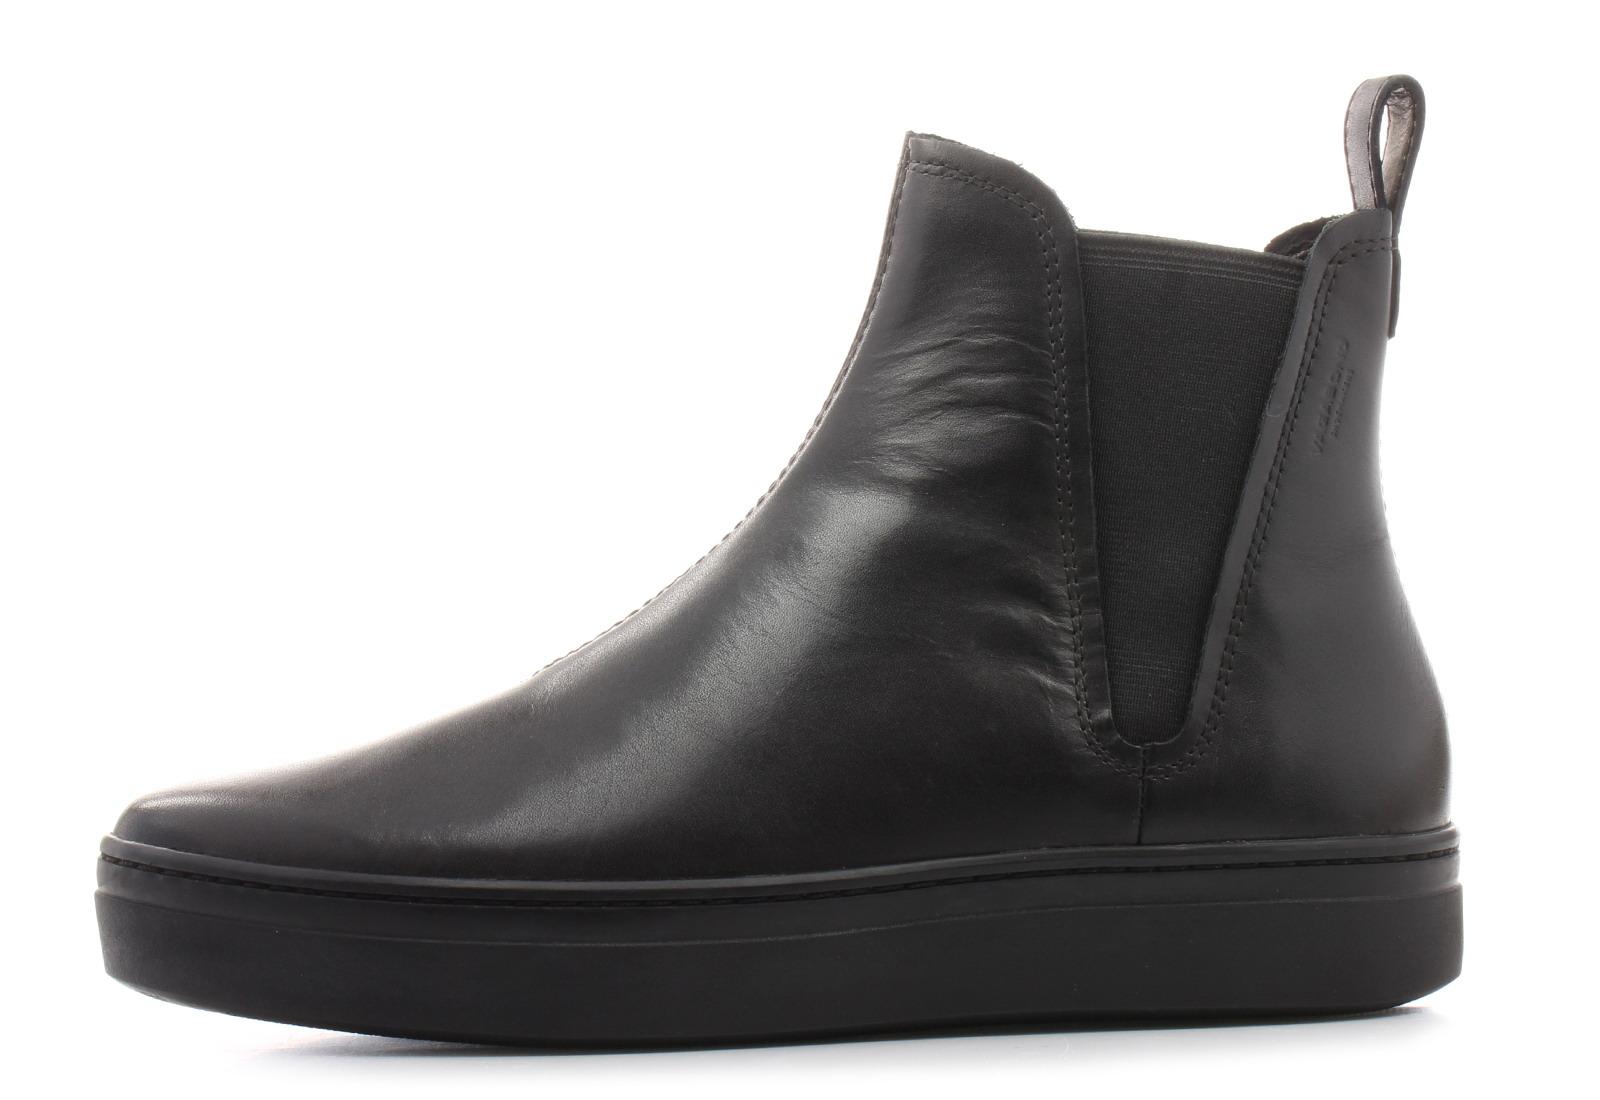 Vagabond Csizma - Camille - 4645-301-92 - Office Shoes Magyarország 77bbf0da8f